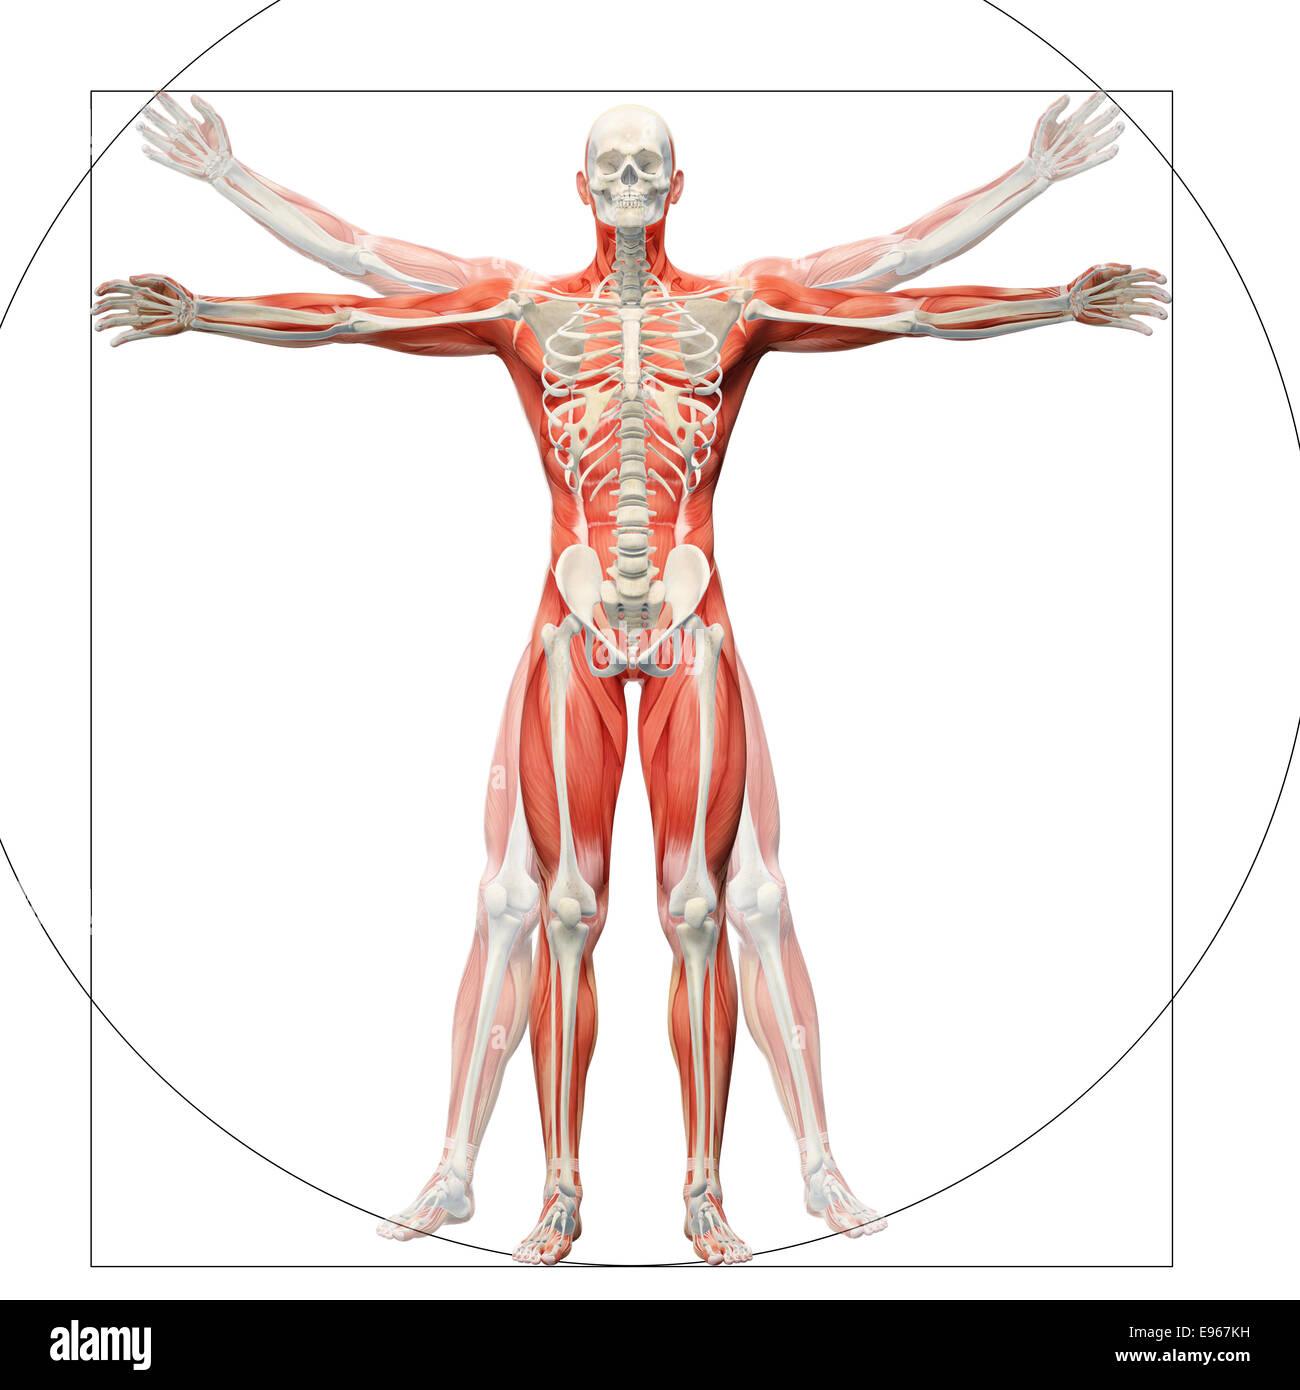 Human anatomy displayed as the vitruvian man by Leonardo da Vinci - Stock Image